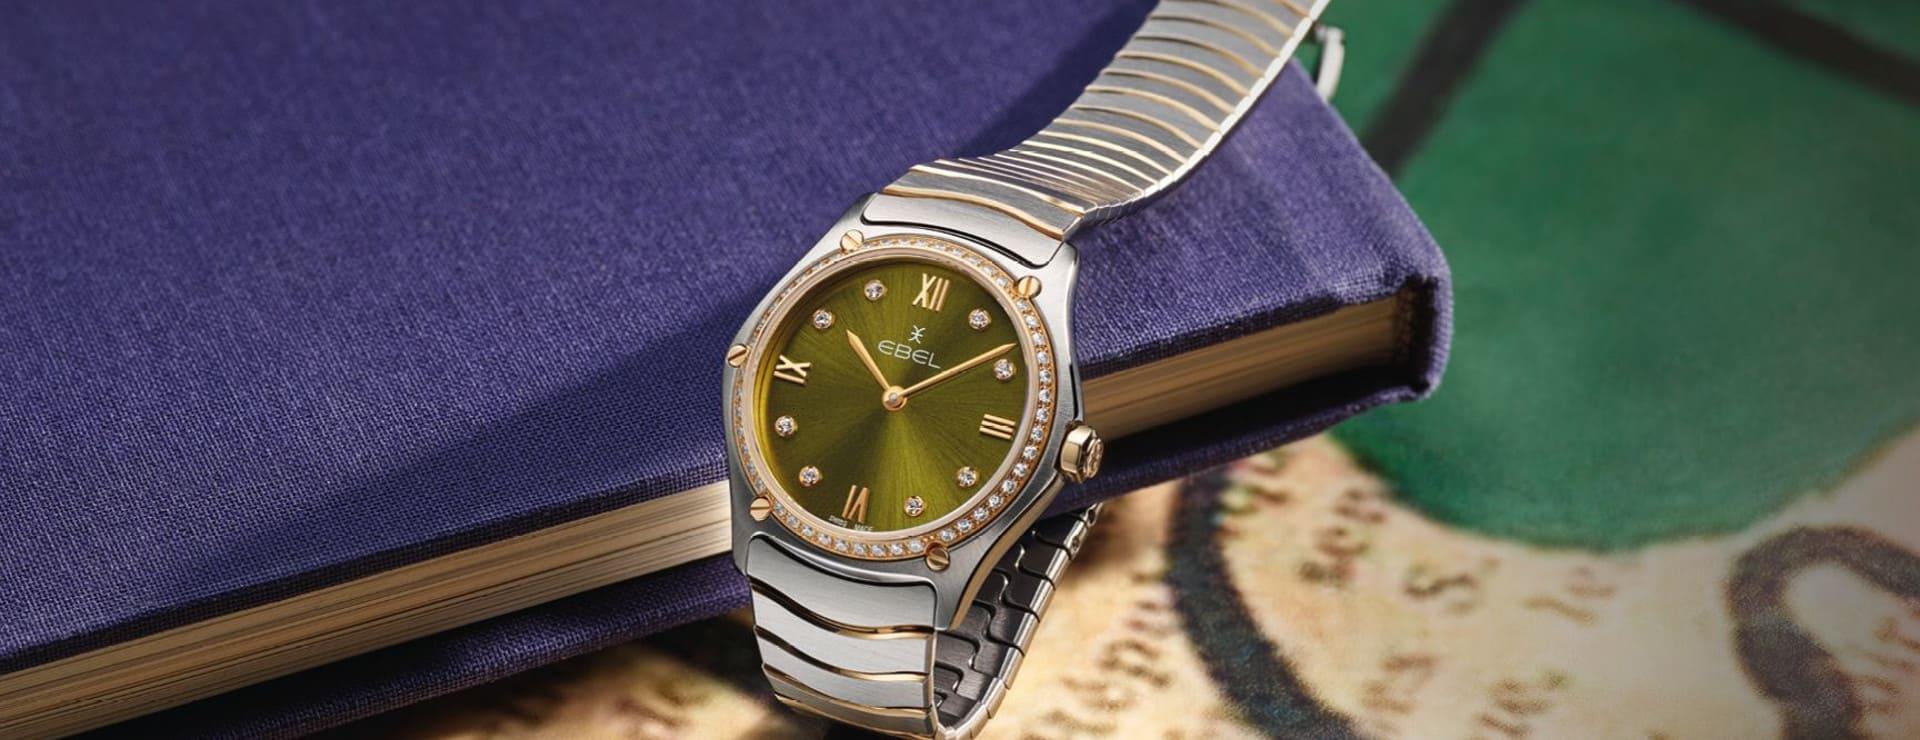 Ebel Sport Classic Uhren